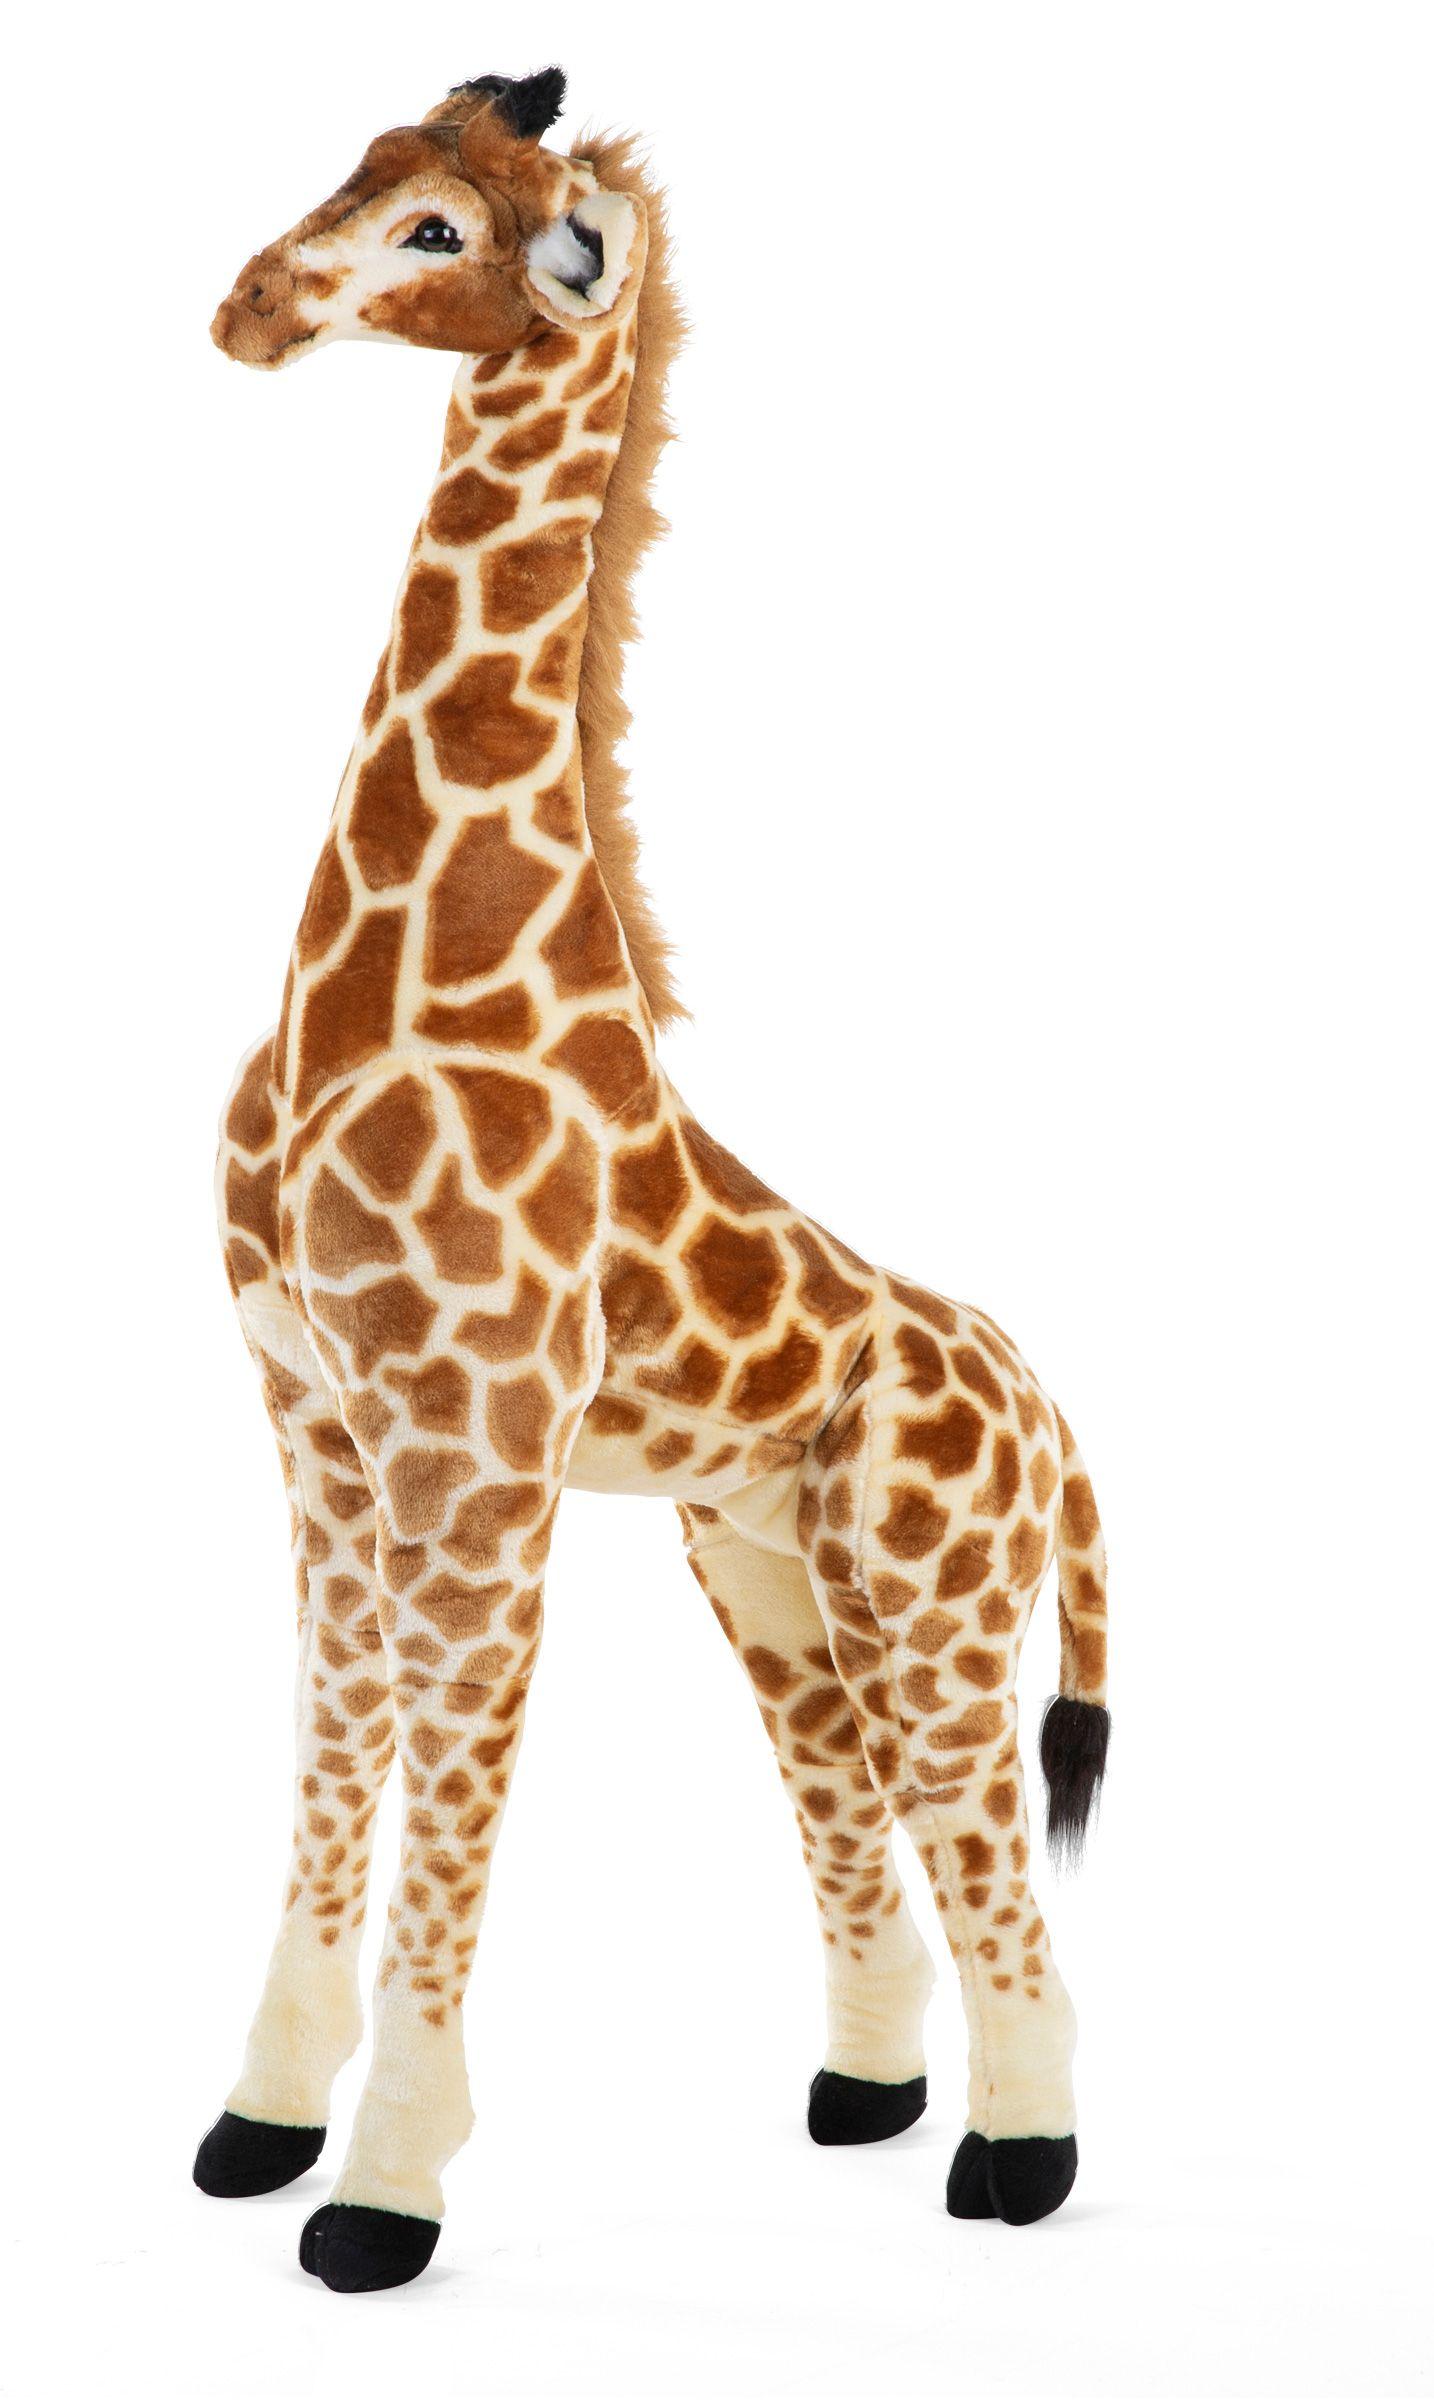 Chilhome staande giraf knuffel - 50X40X135 CM - BRUIN GEEL